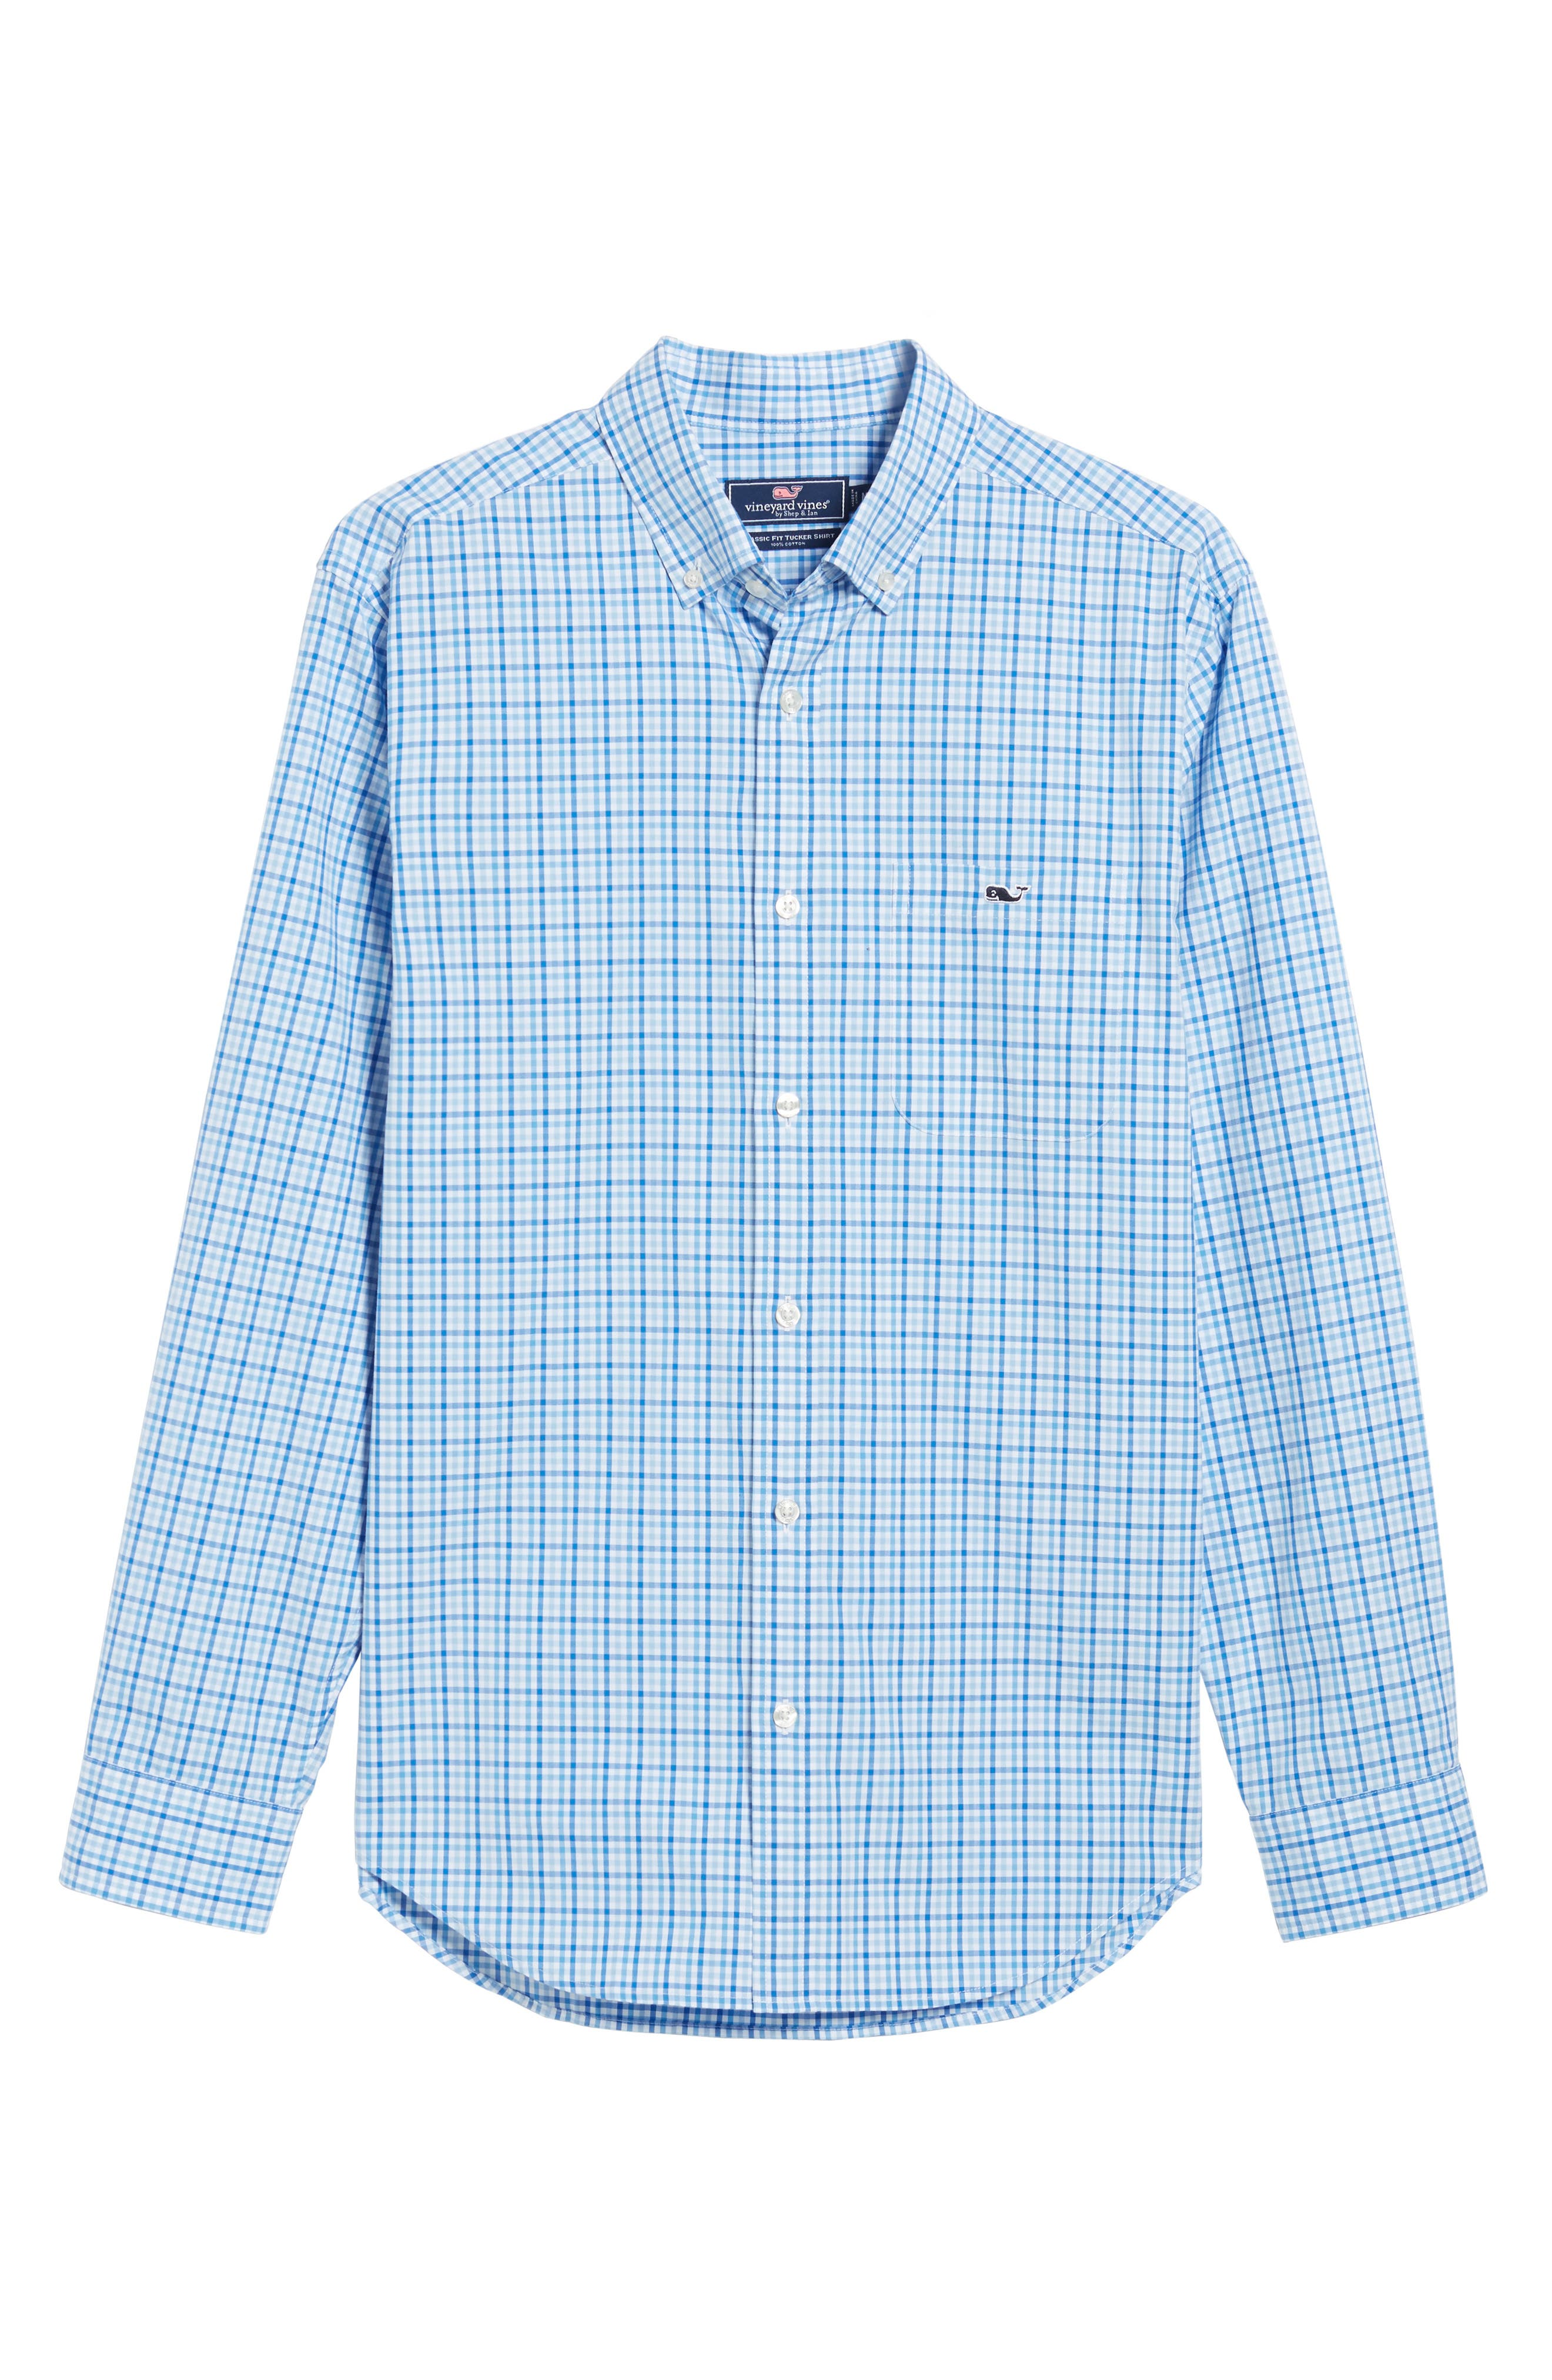 Munroe Tucker Classic Fit Gingham Sport Shirt,                             Alternate thumbnail 6, color,                             456